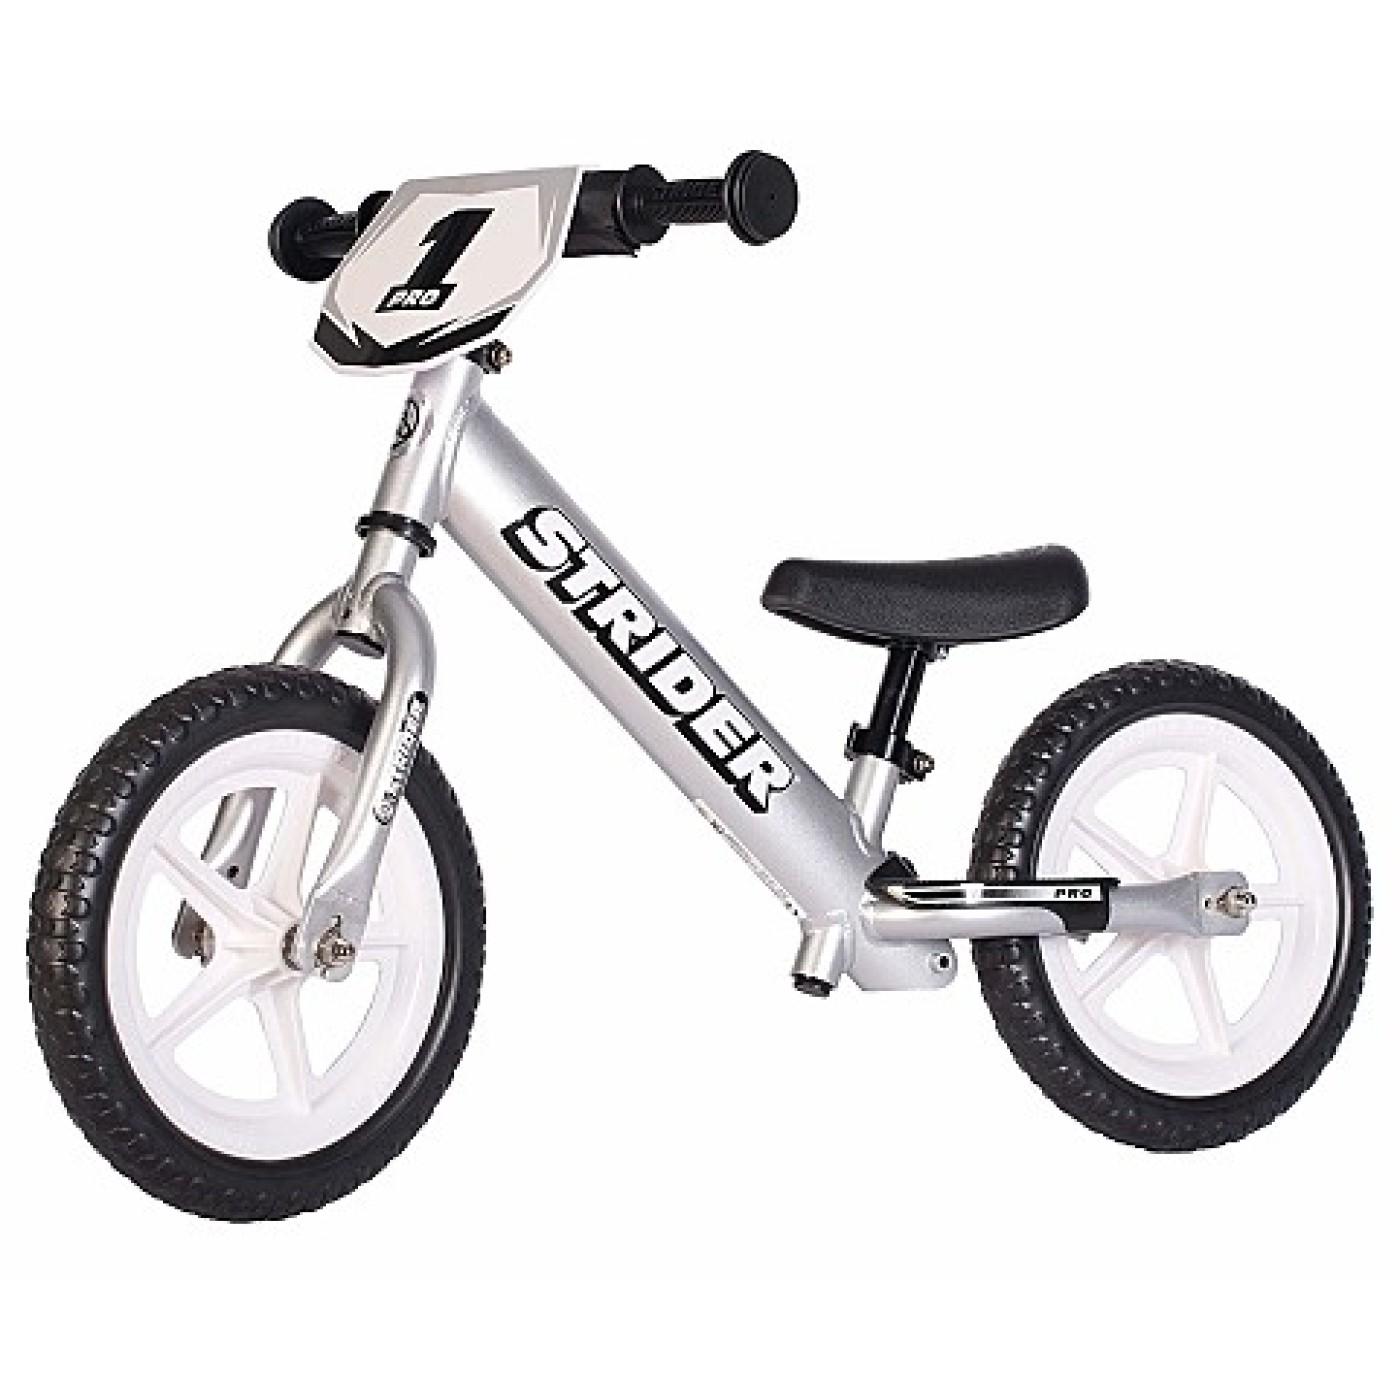 Strider 12 Pro Balance Bike - Silver